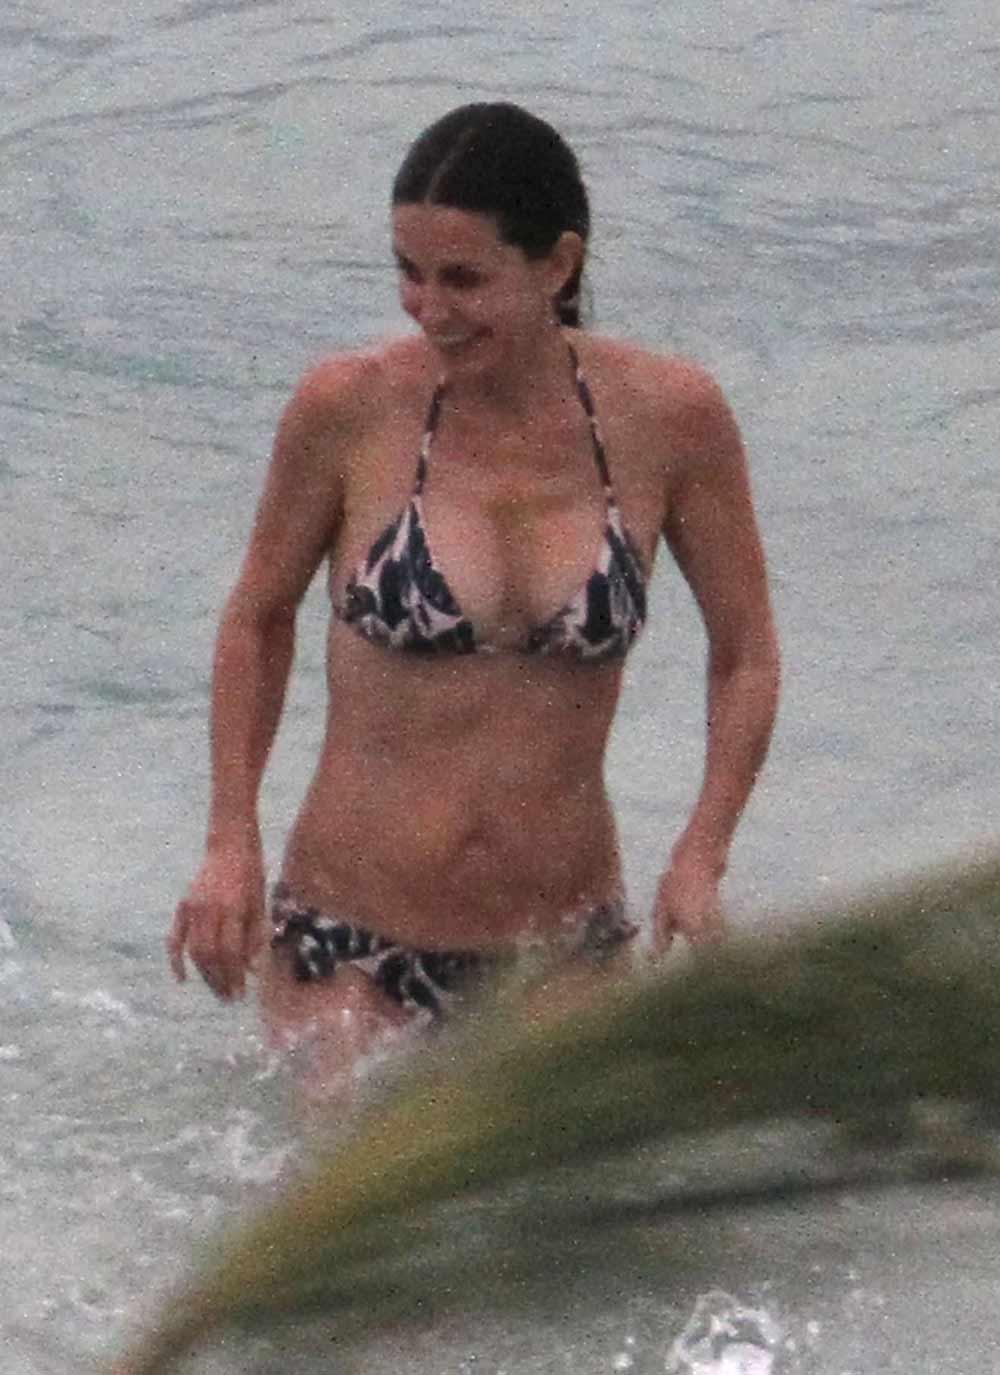 Nicki minaj bikini thong